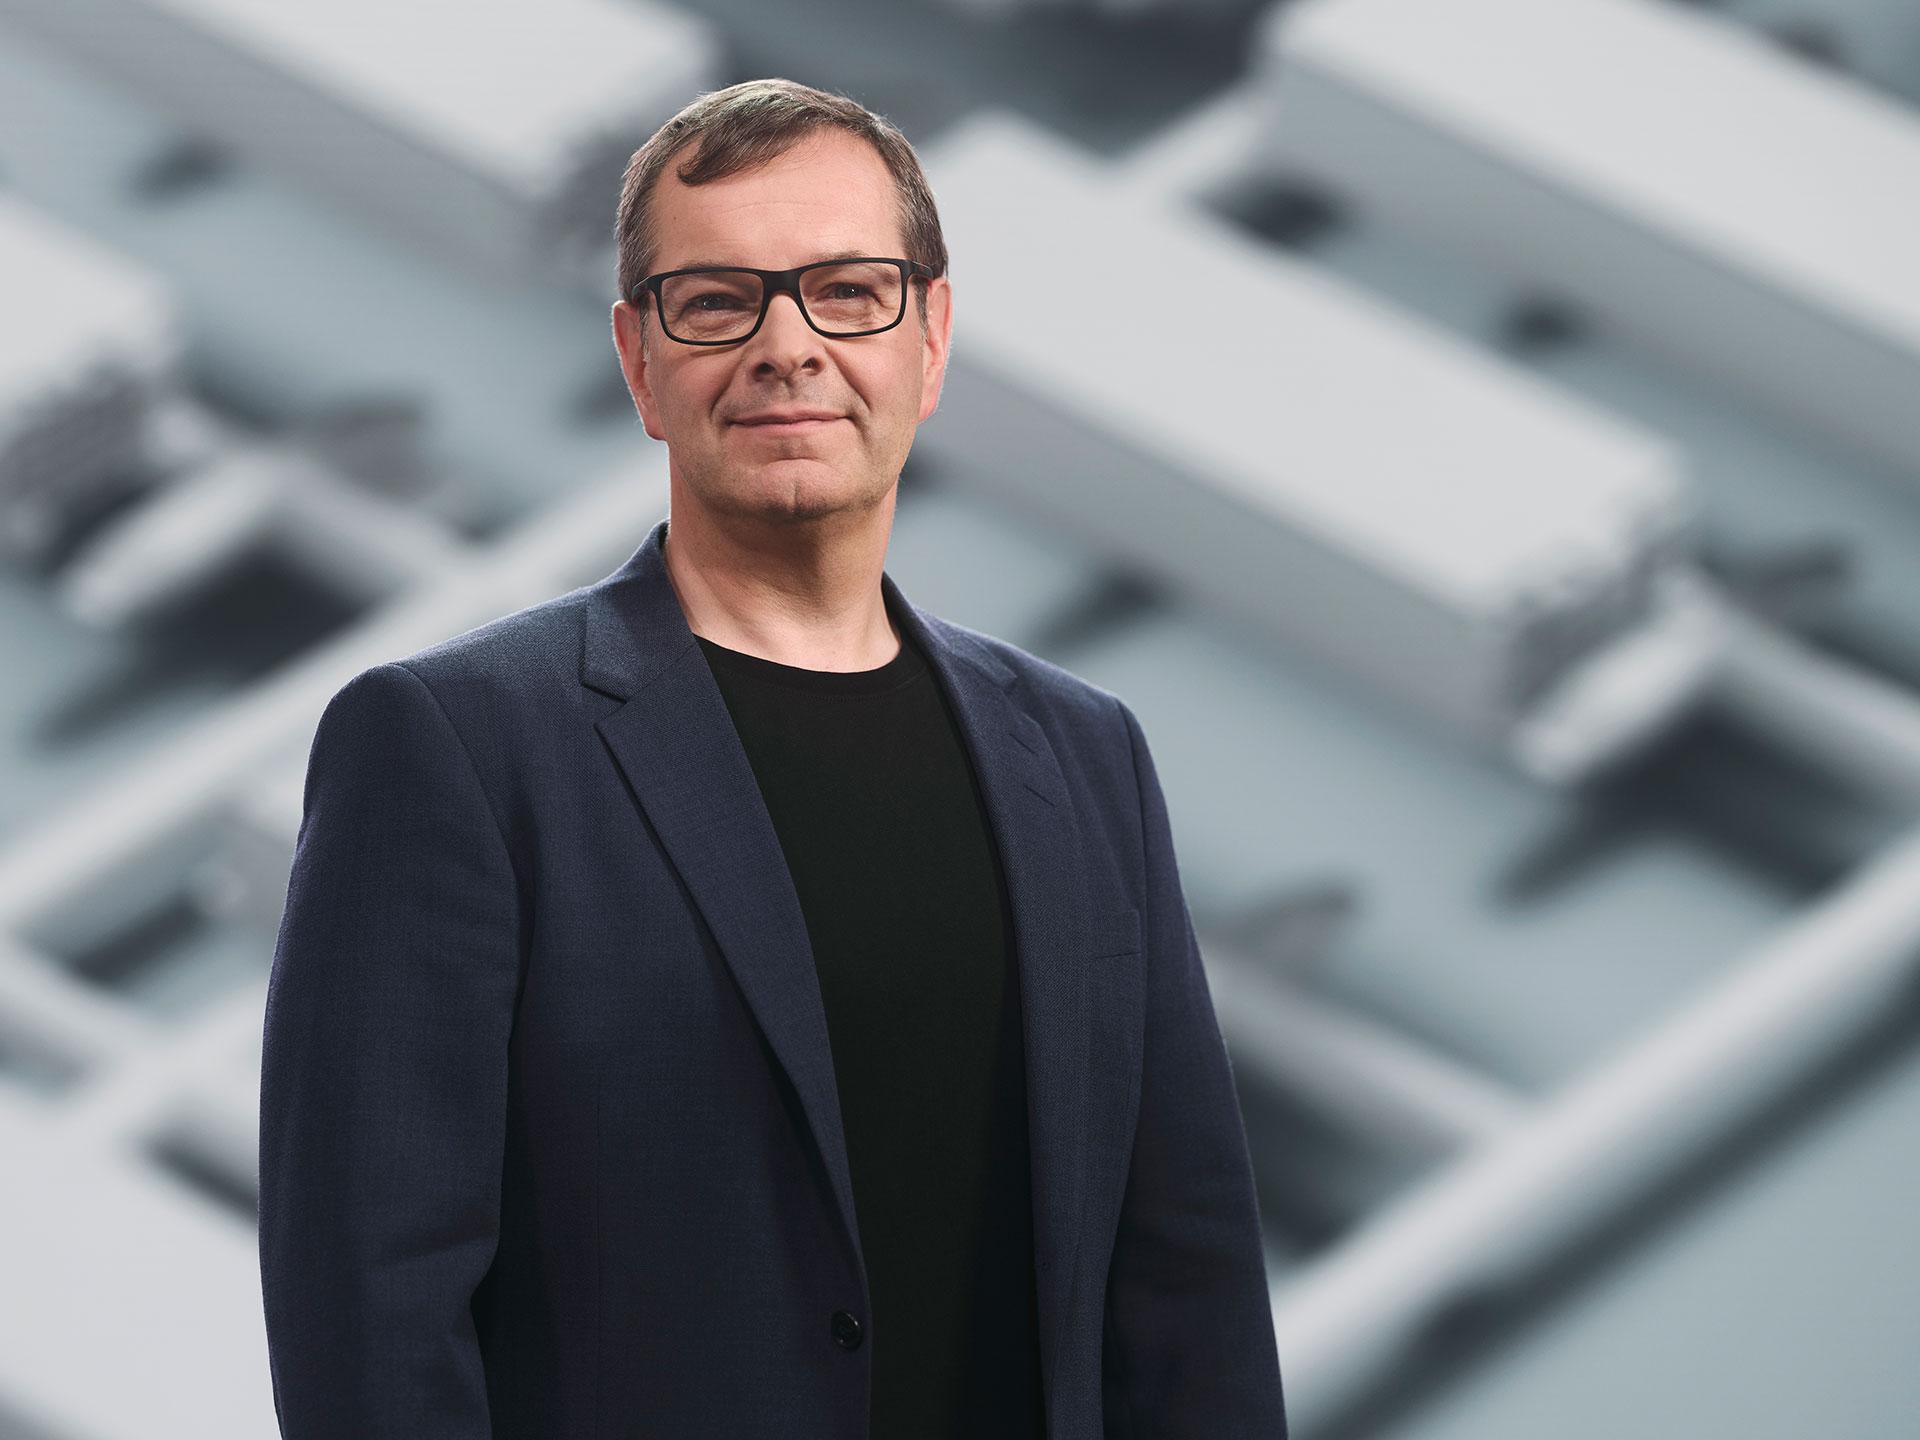 Lutz Stiegler, leader in vehicle propulsion Volvo tech moment 2021.